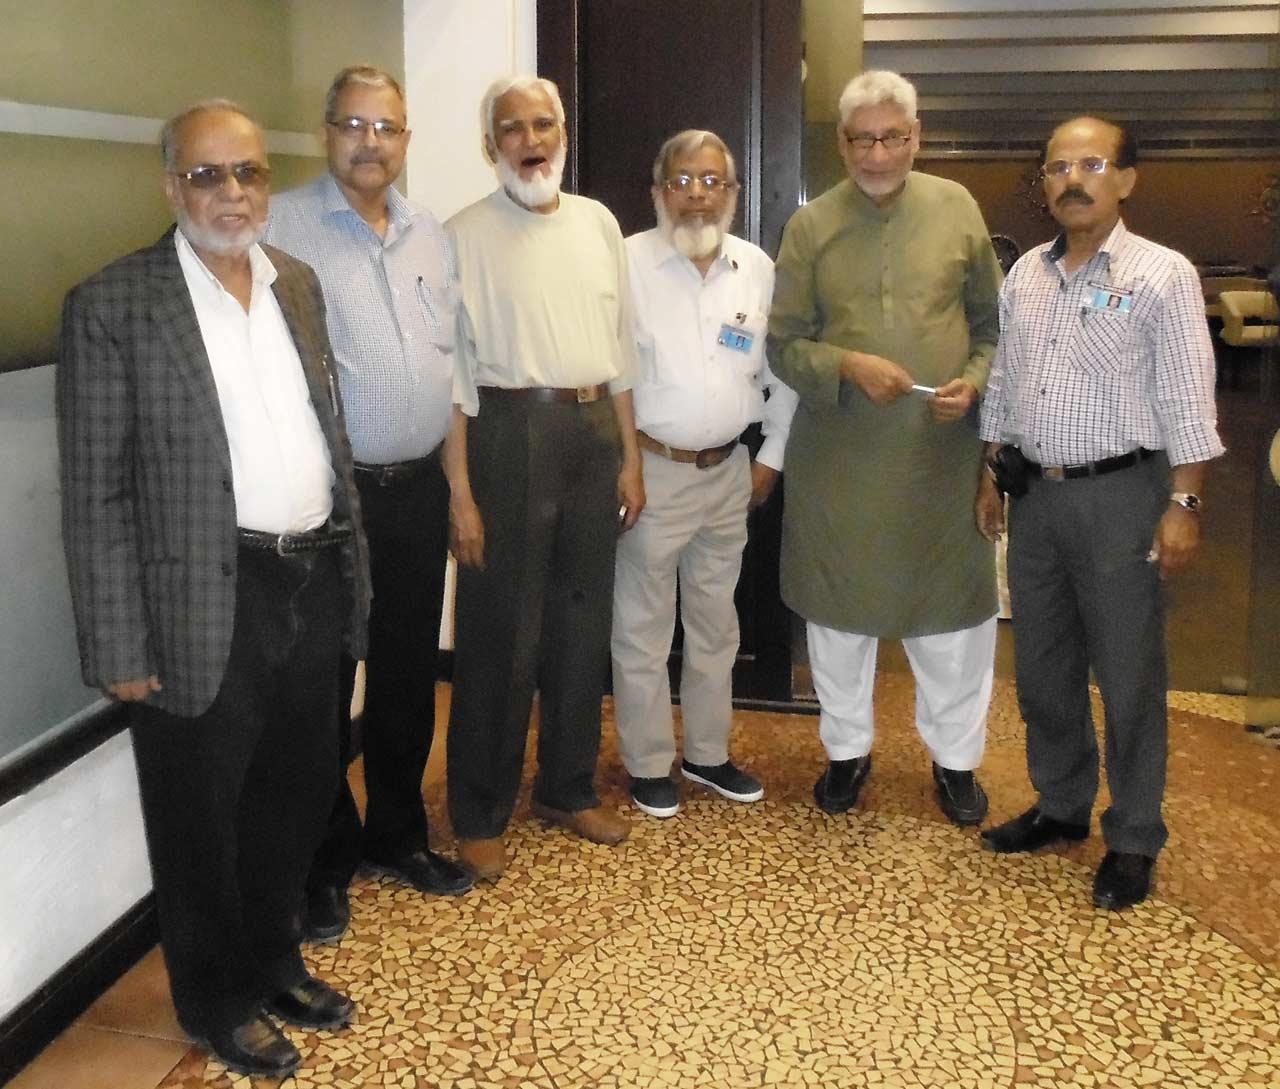 A group of SAEEA Office Bearers : Mohammed Abdul Matin, Arif Qamar, Kamal A. Farooqi, Engr. Iqbal A. Khan, Muhammed Salim Hamid, Shafiq A. Khan